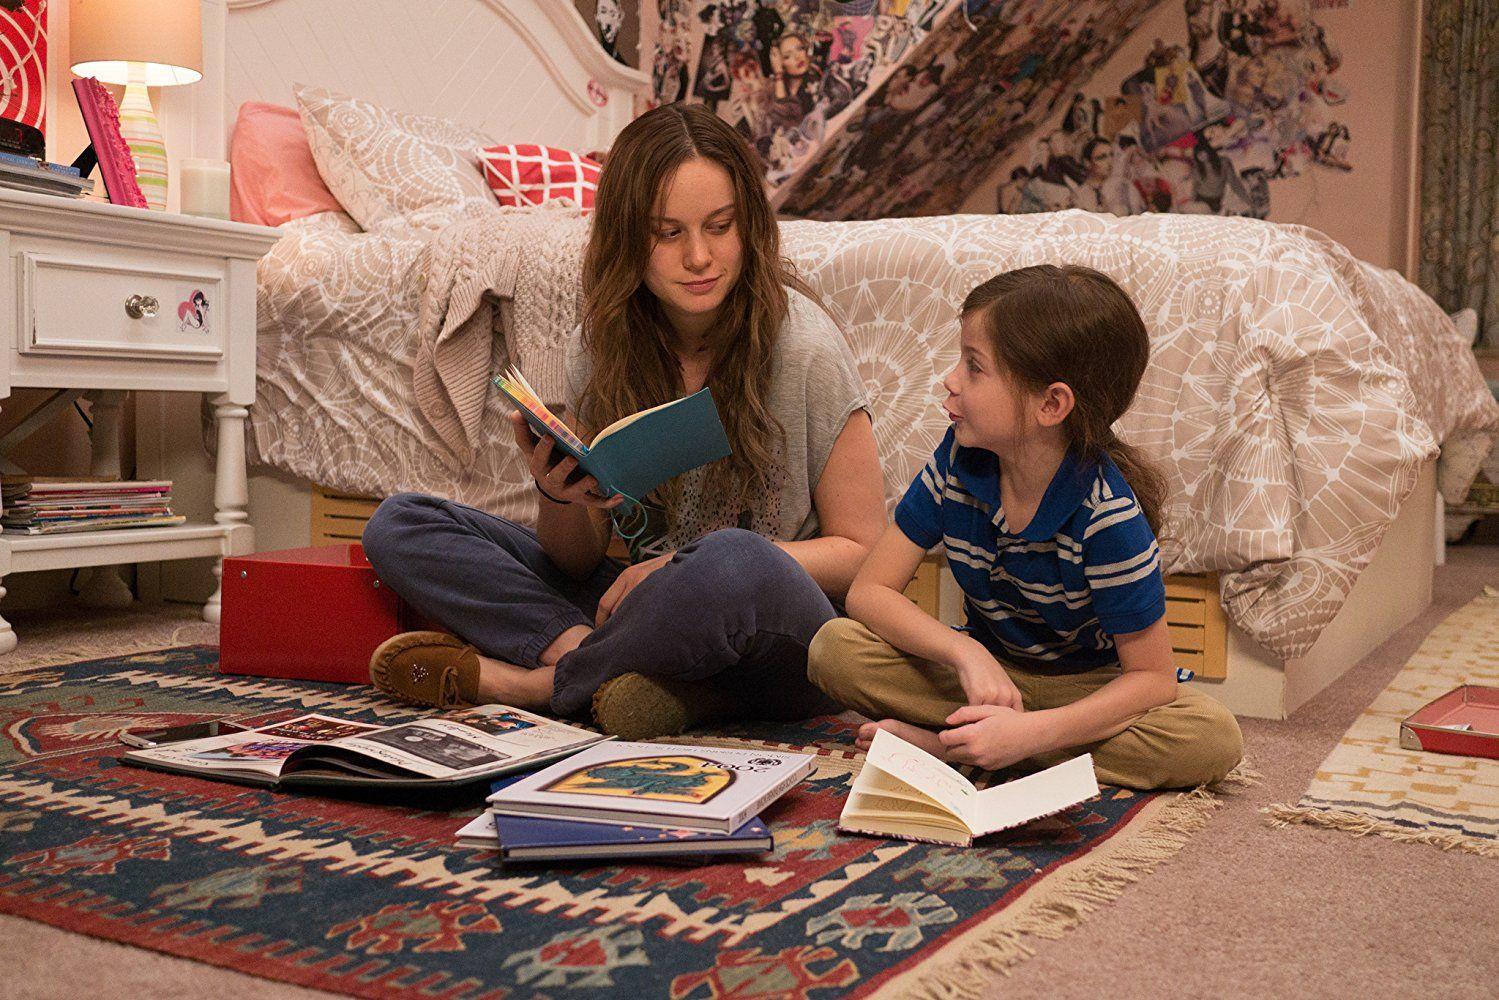 Migliori film ambientati dentro casa